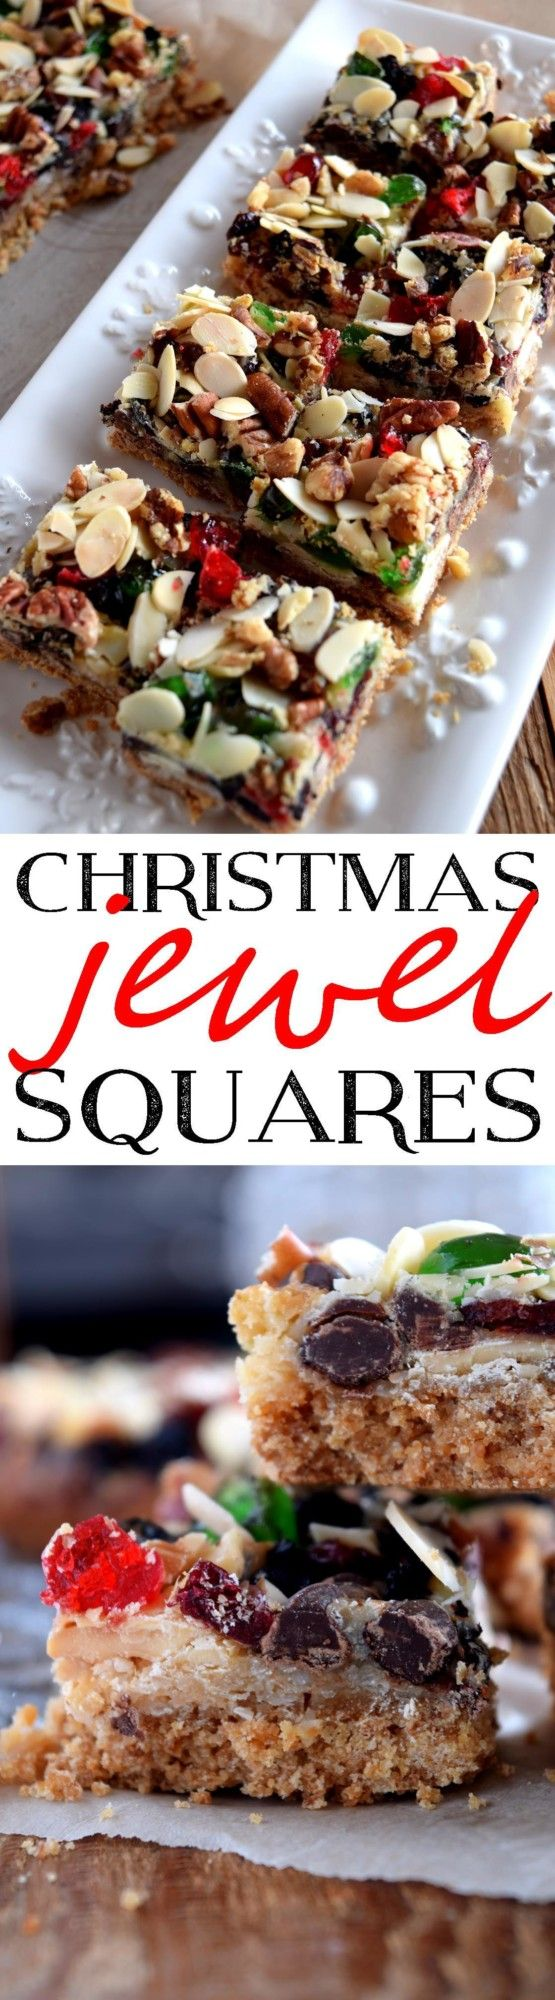 christmas-jewel-squares